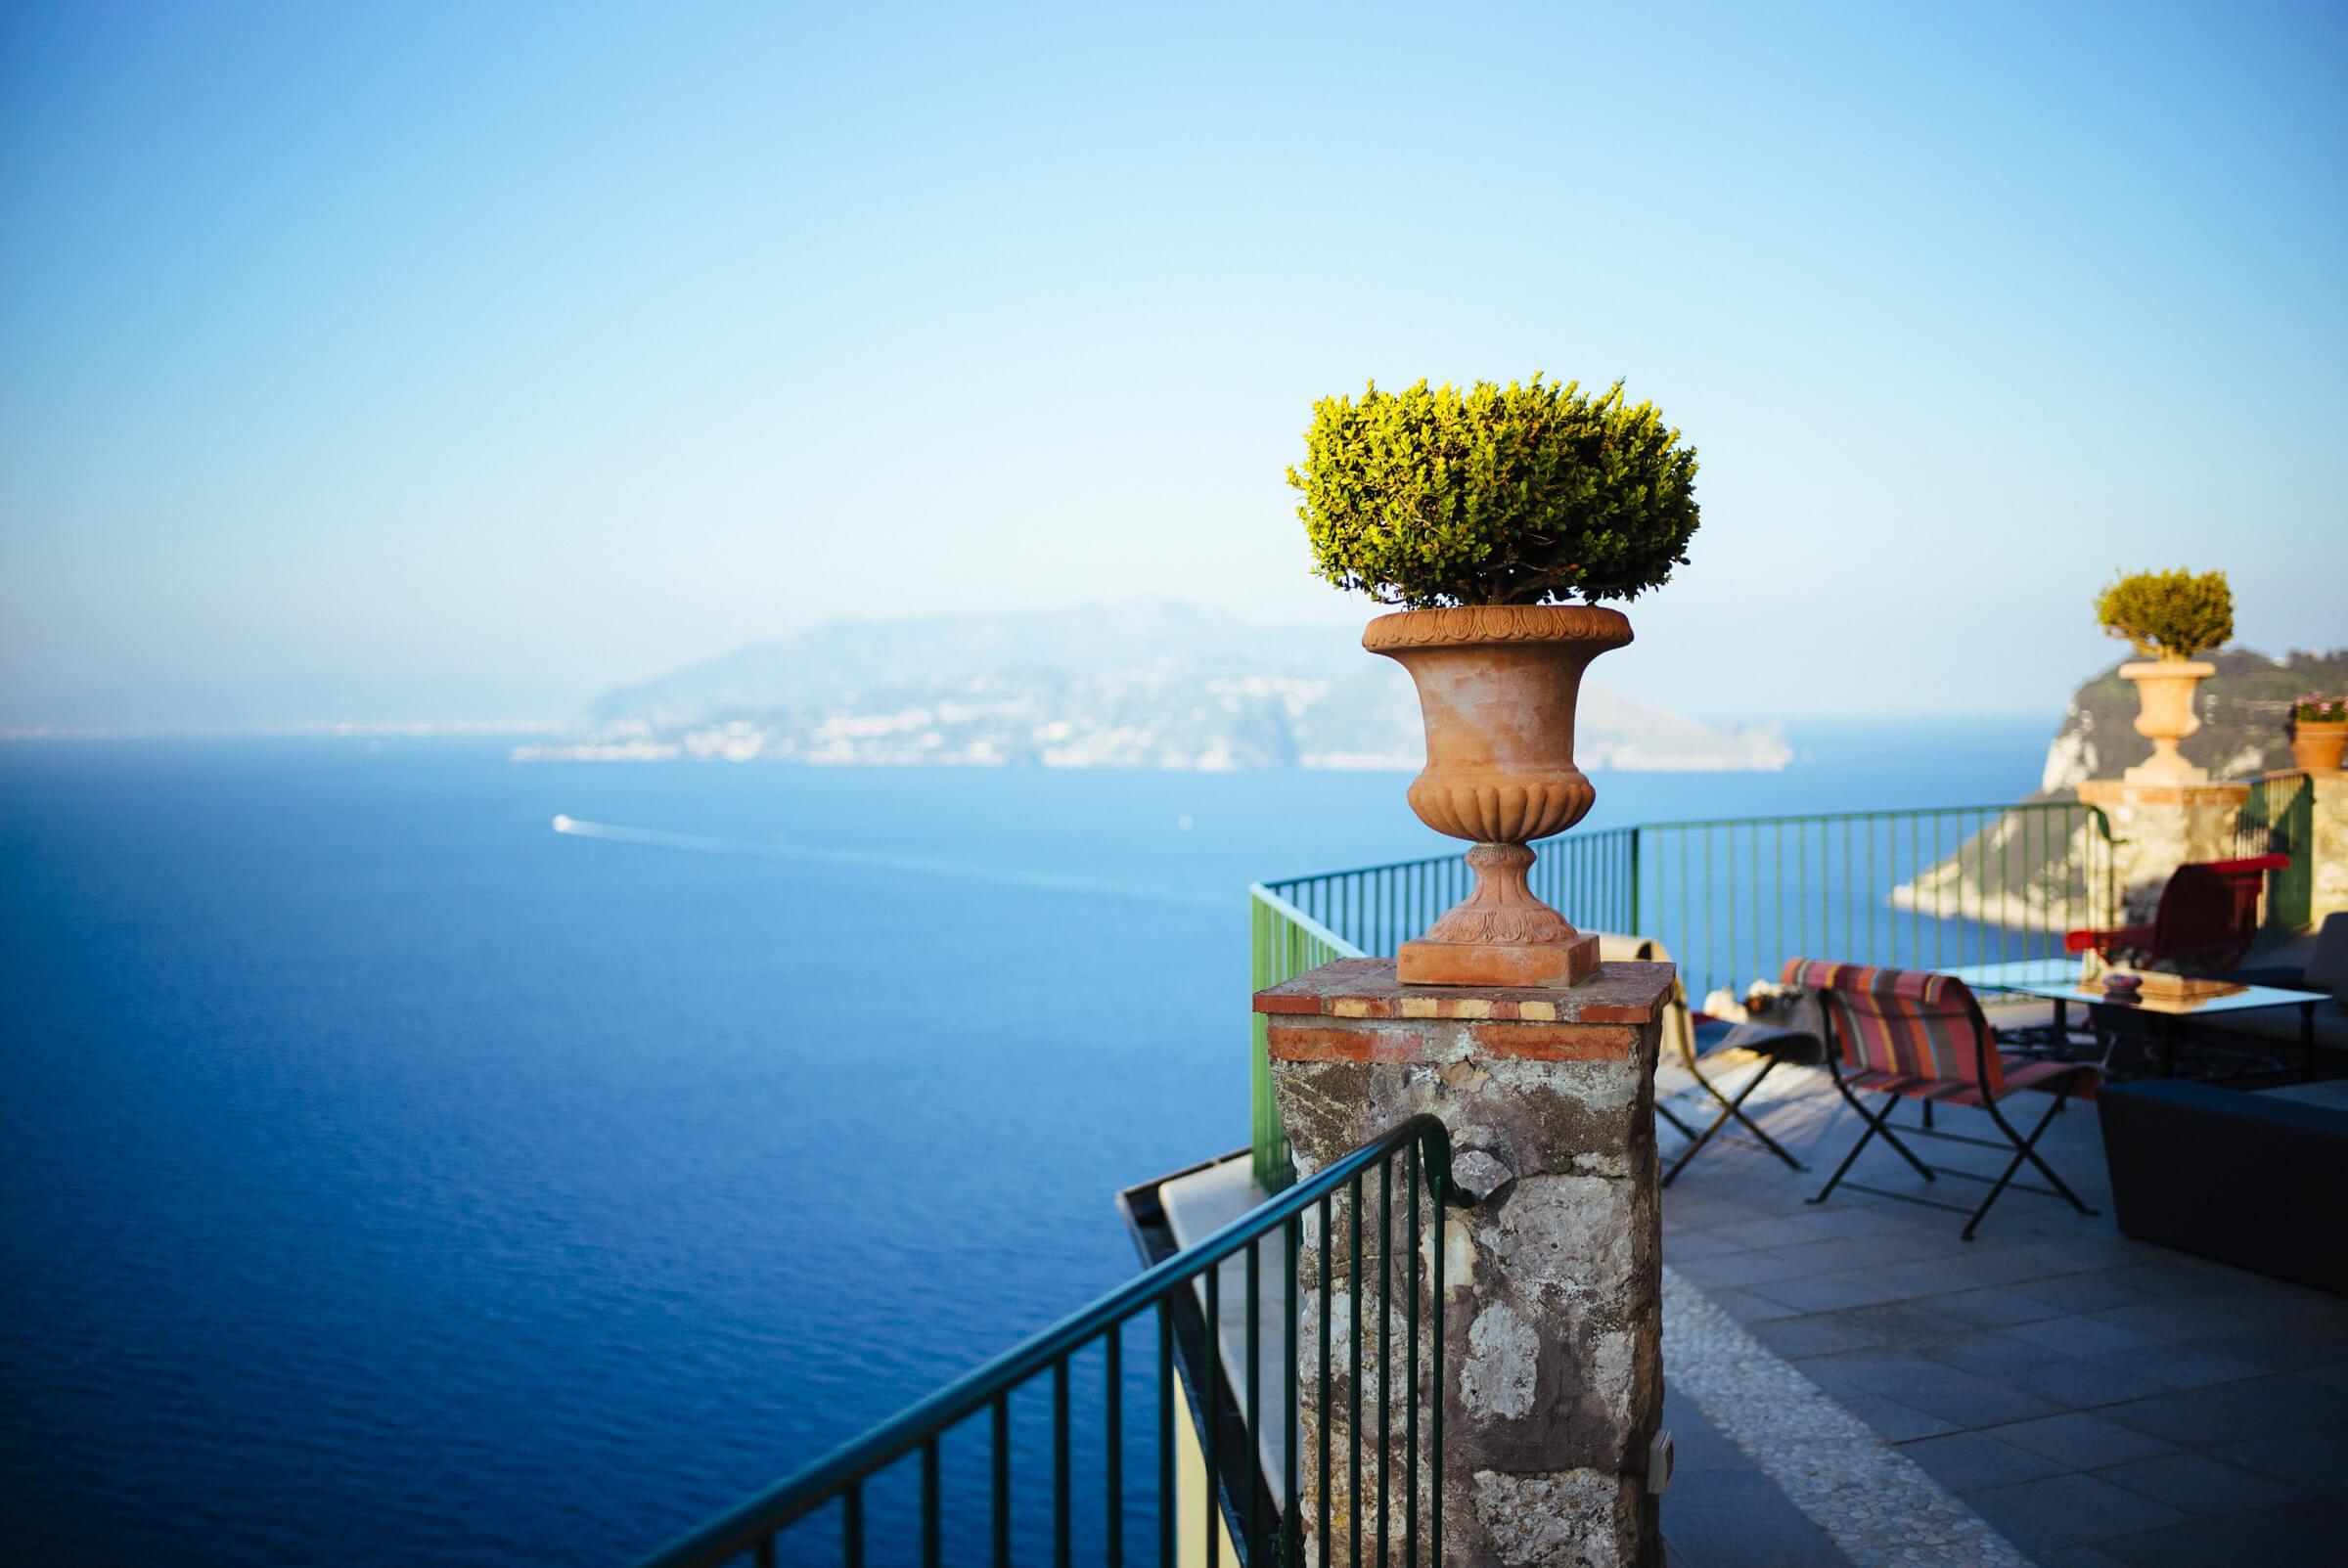 Overlook on the balcony off Hotel Caesar Augustus Capri Italy, The Taste SF